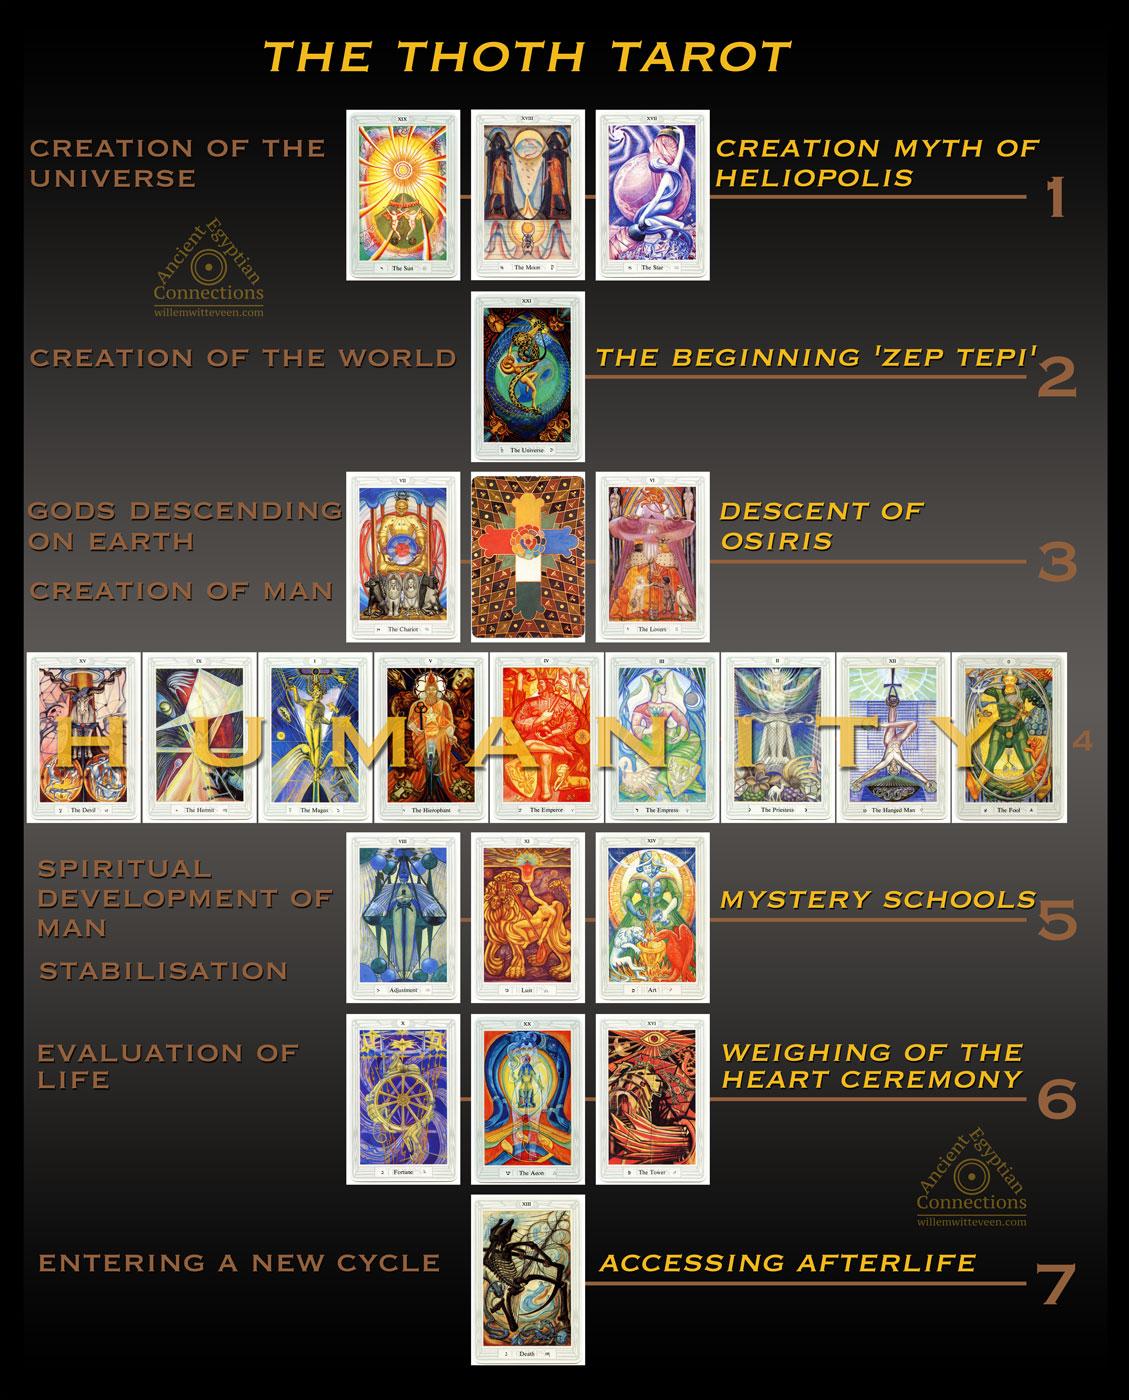 The Thoth Tarot